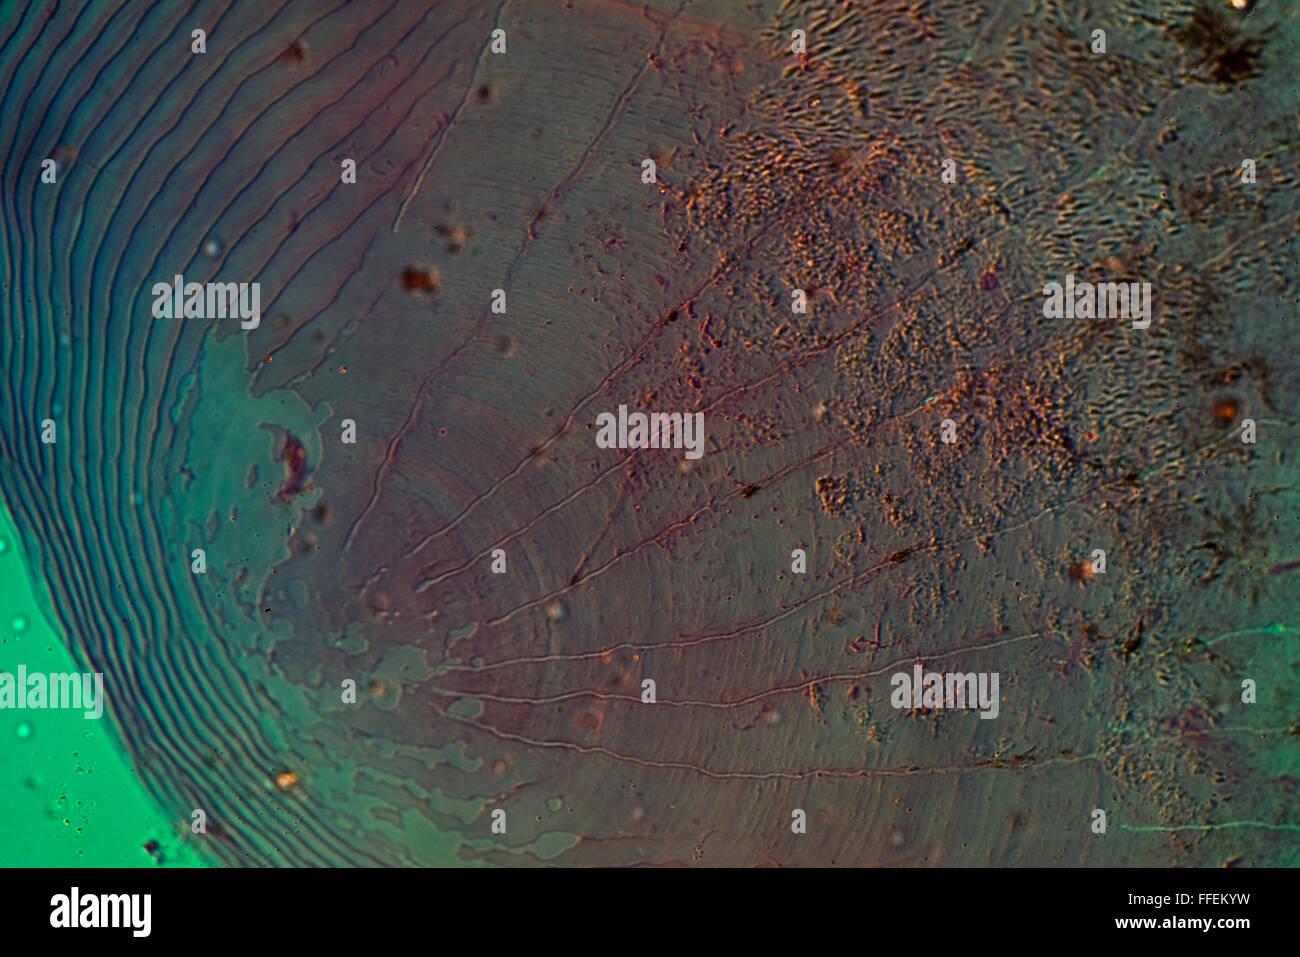 Microscopic image fish scale - Stock Image